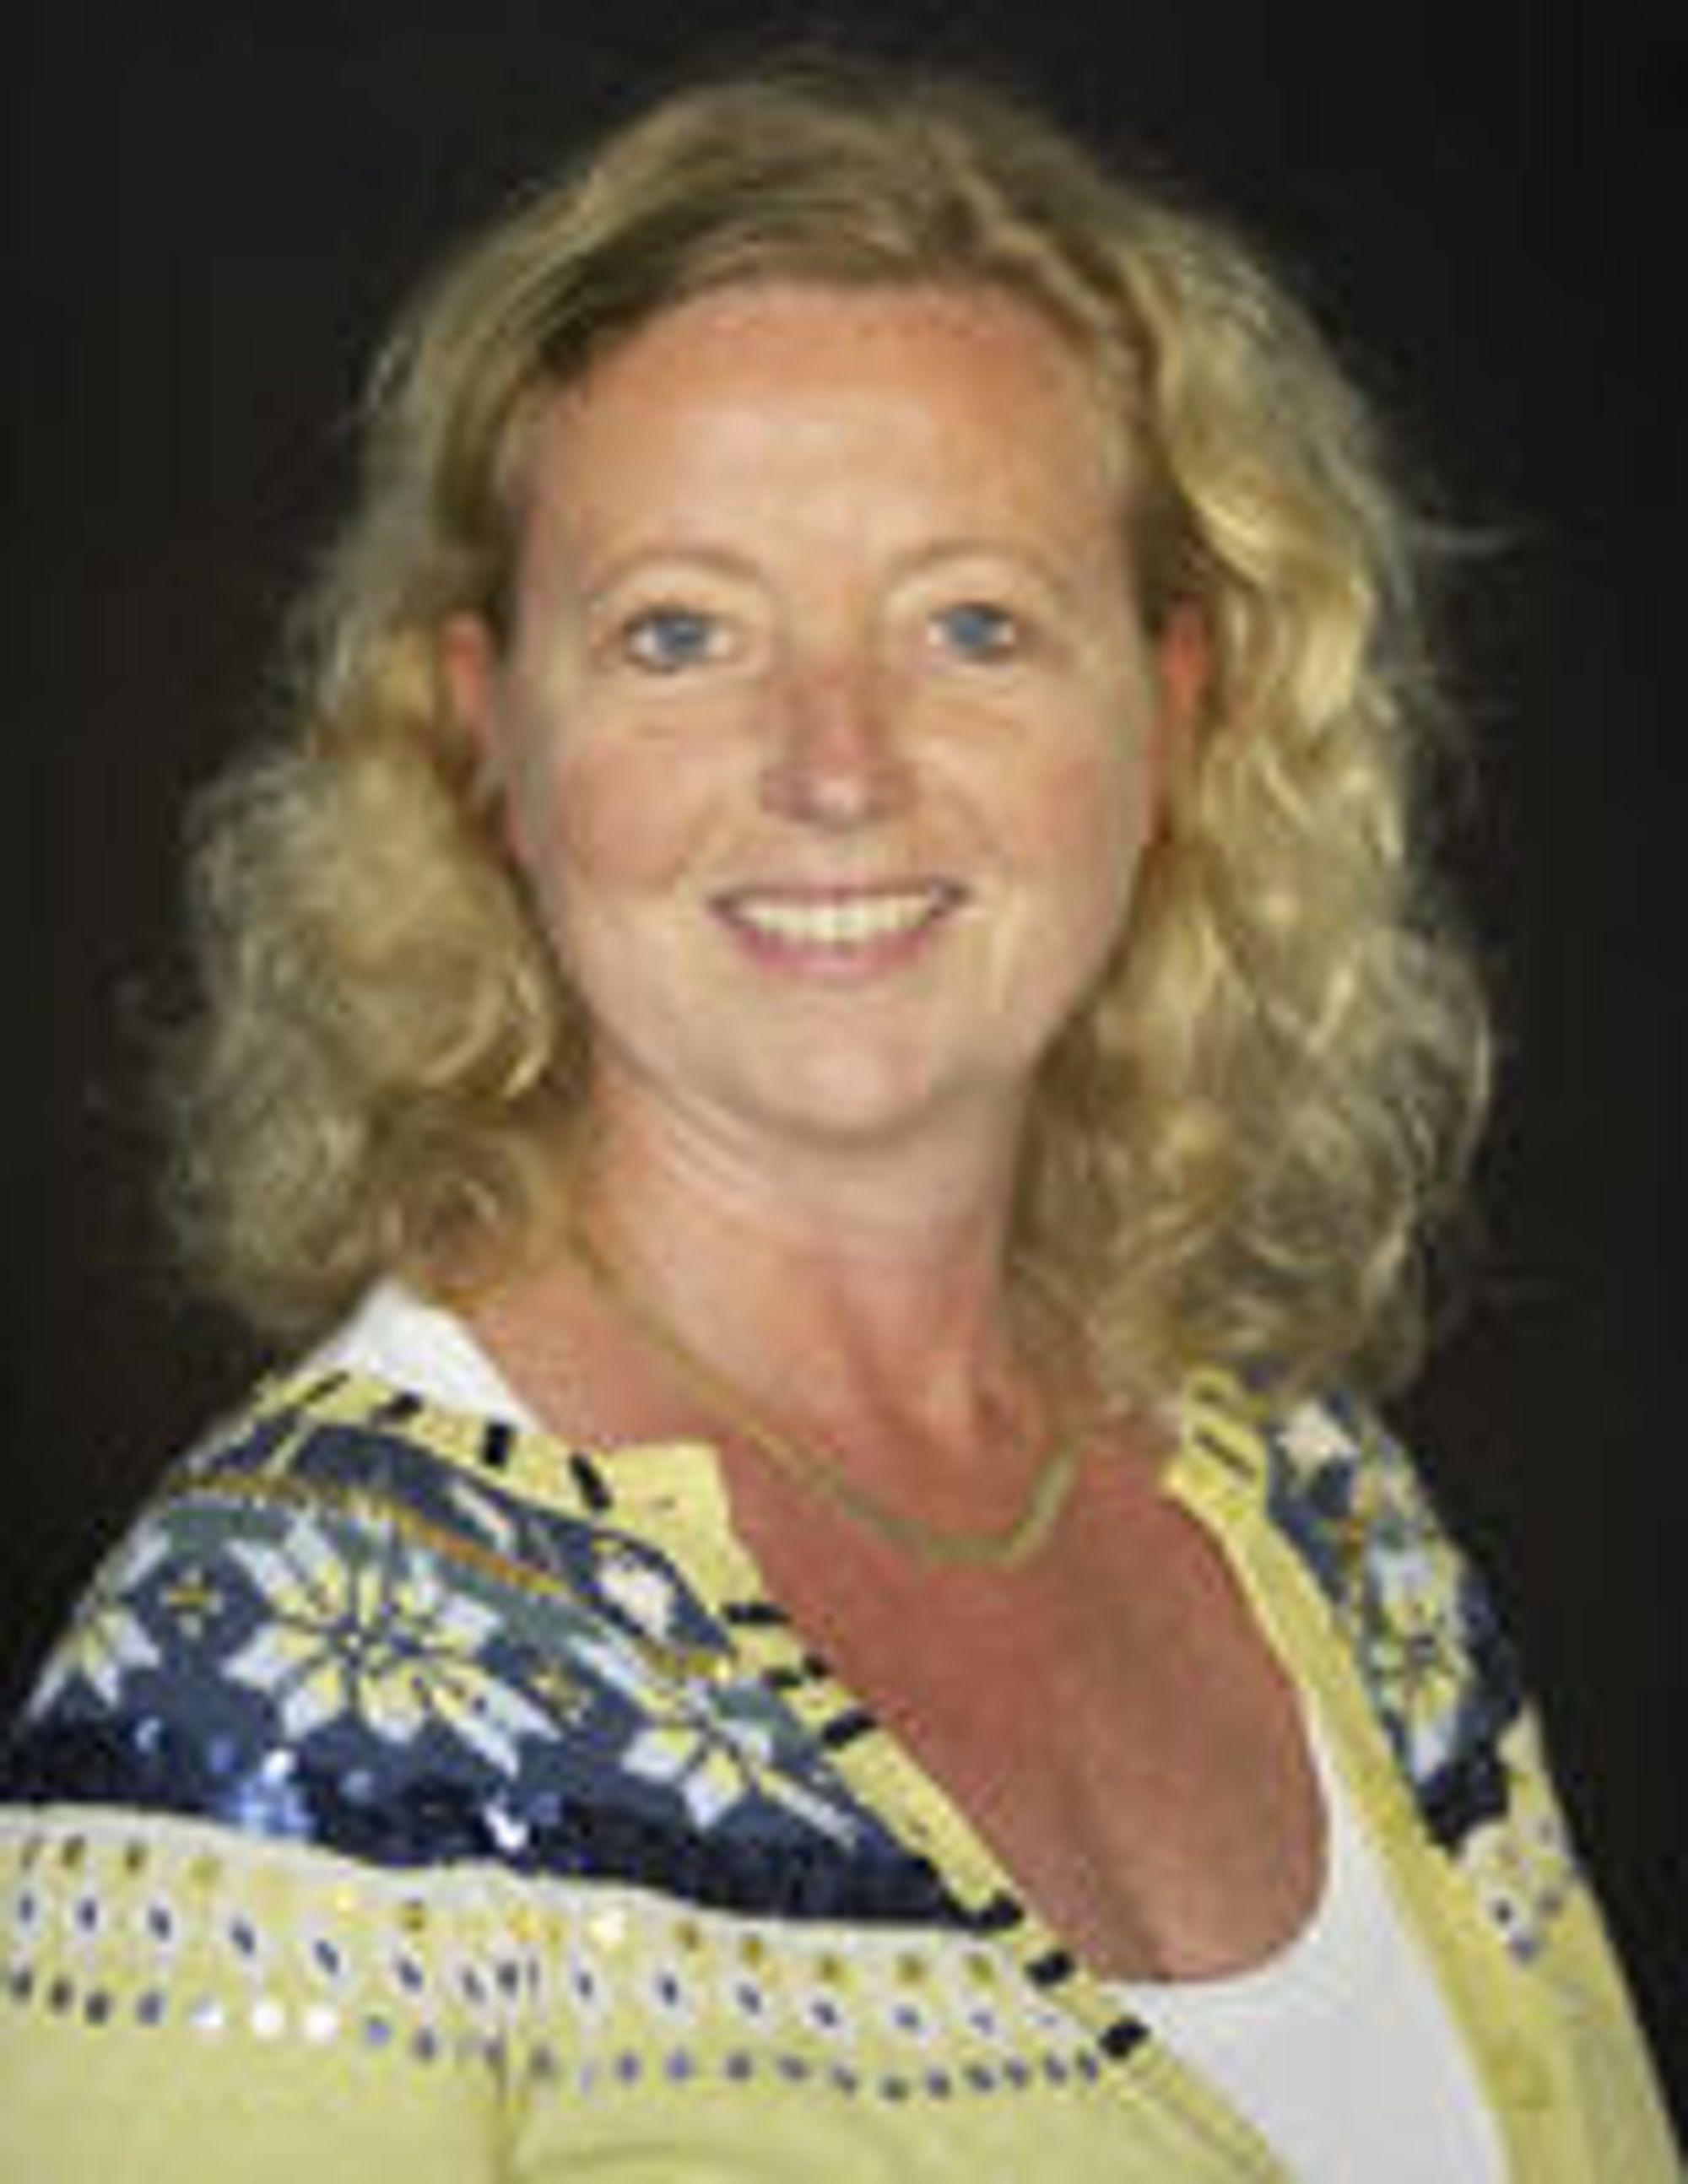 Styremedlem og storeier Kari Stautland i Opera Software.